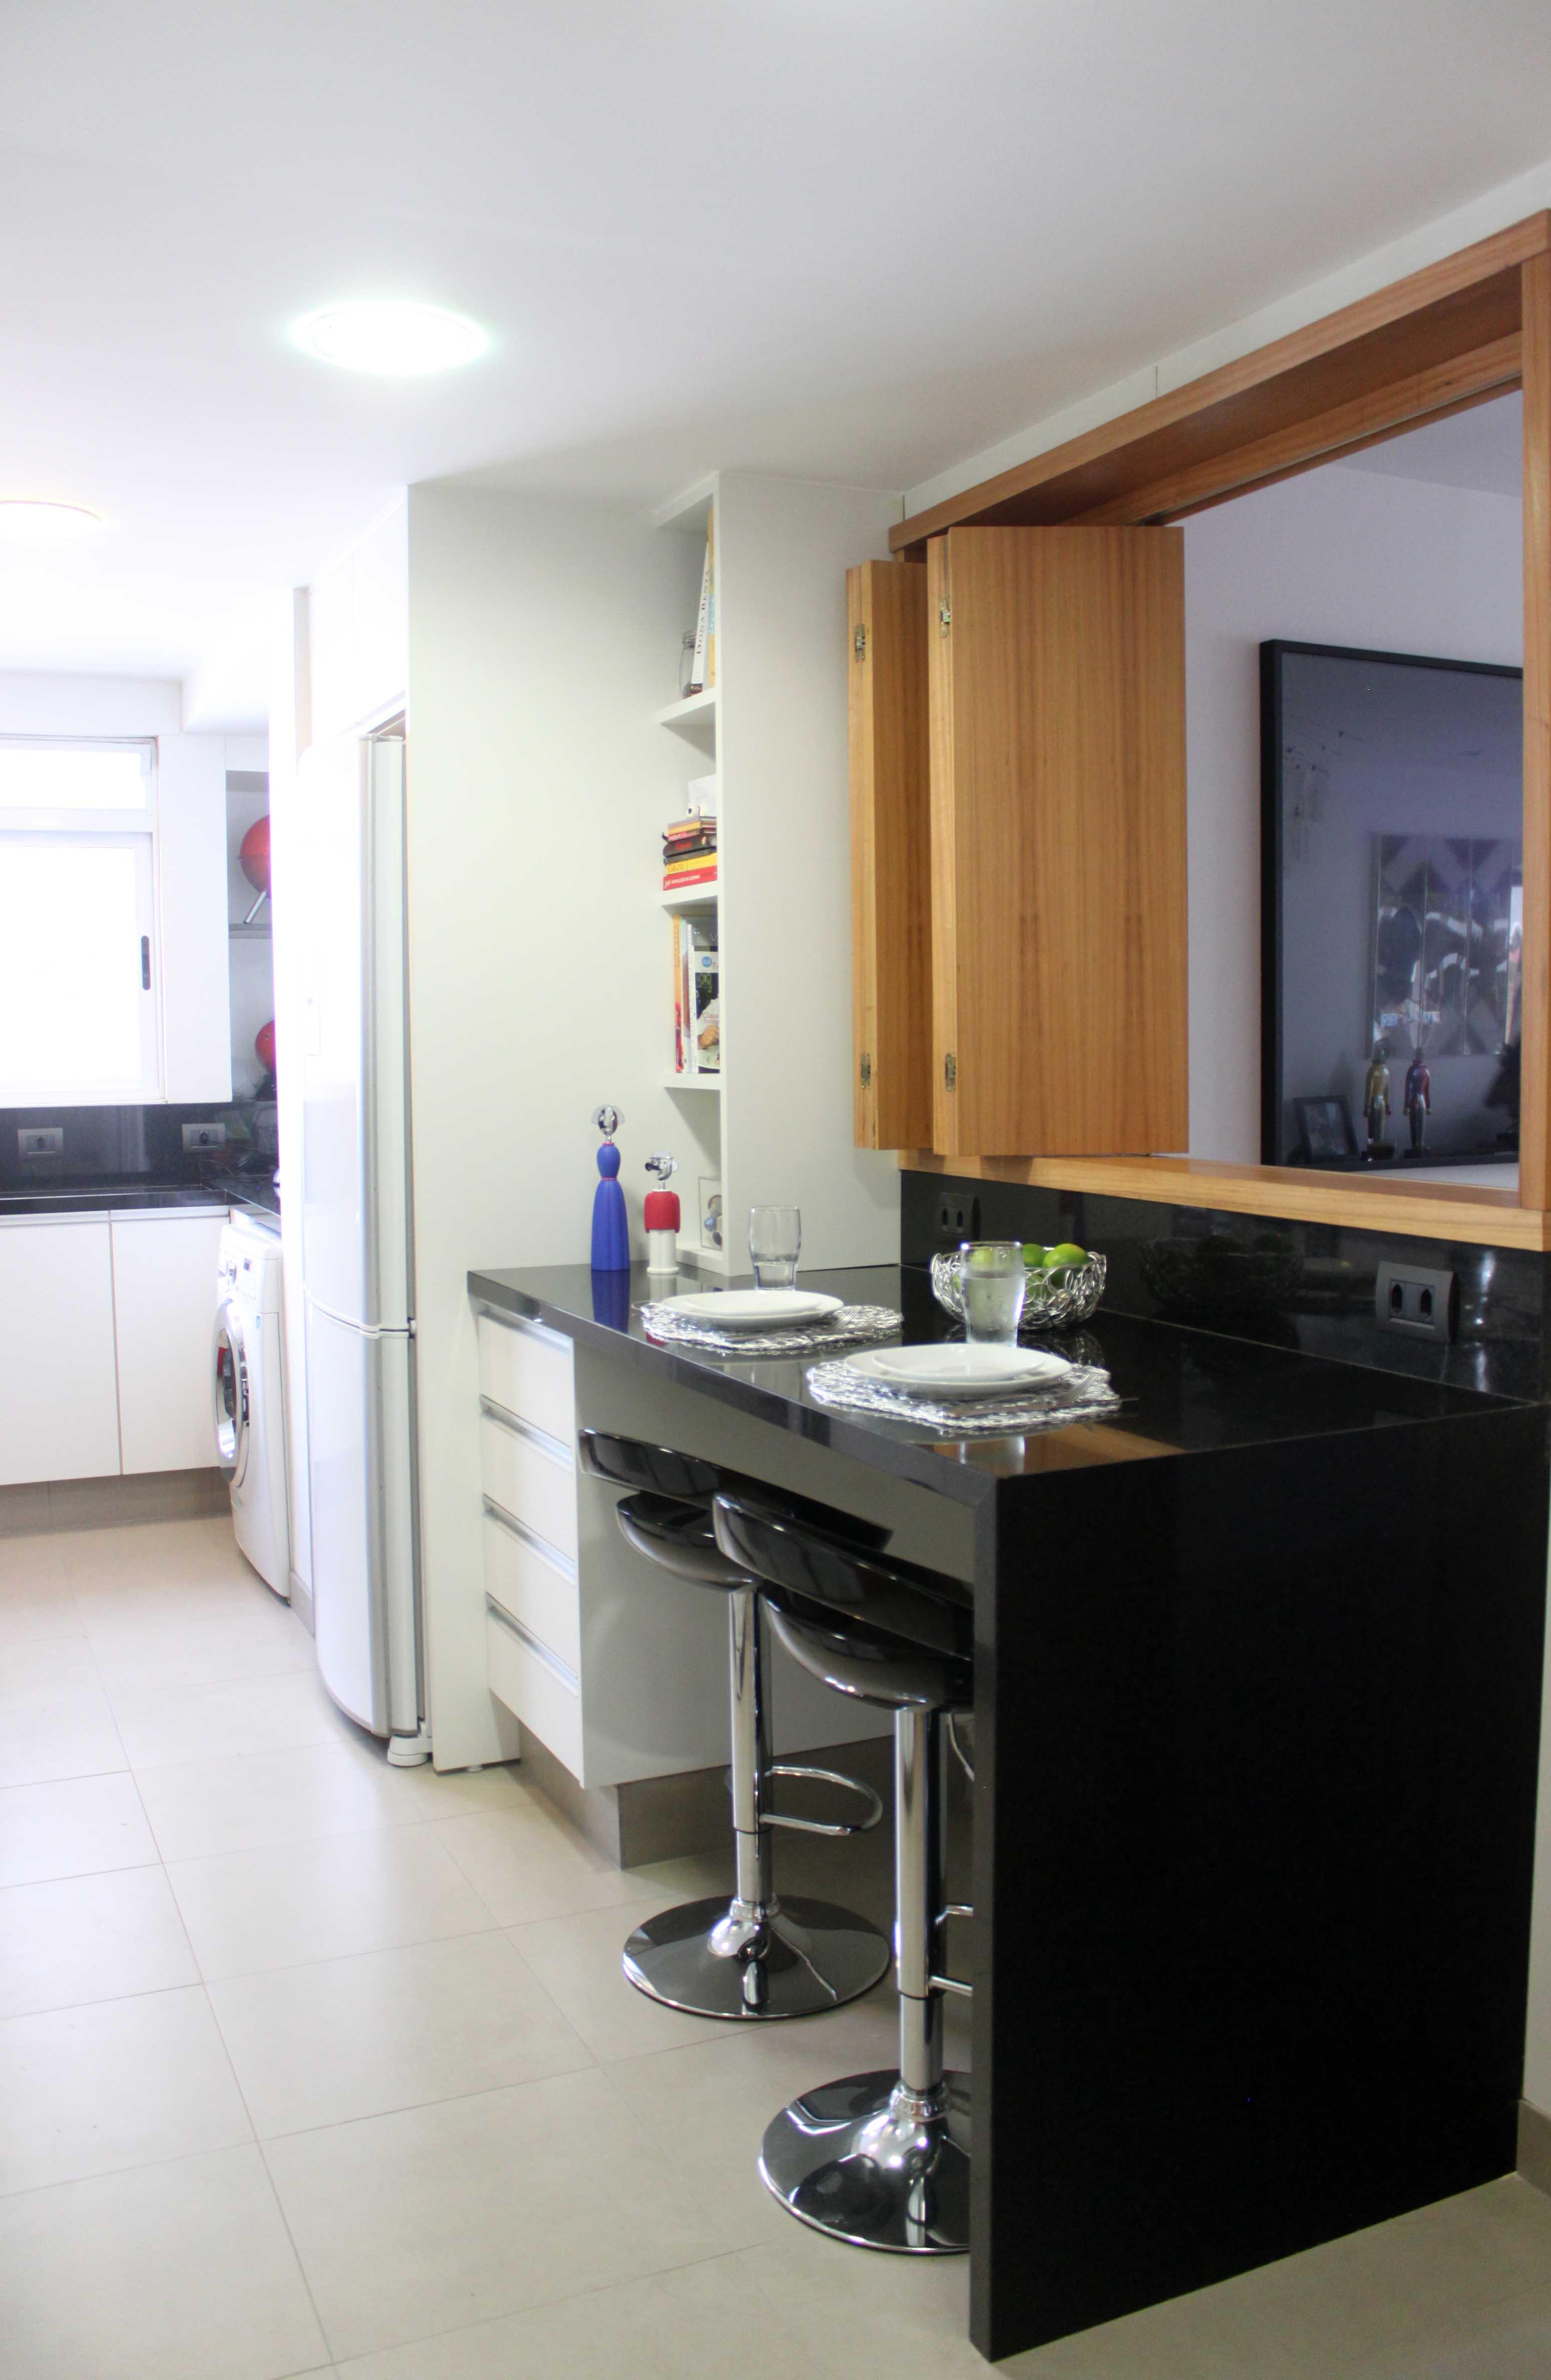 Mallemont Arquitetura entrega apartamento no Leblon